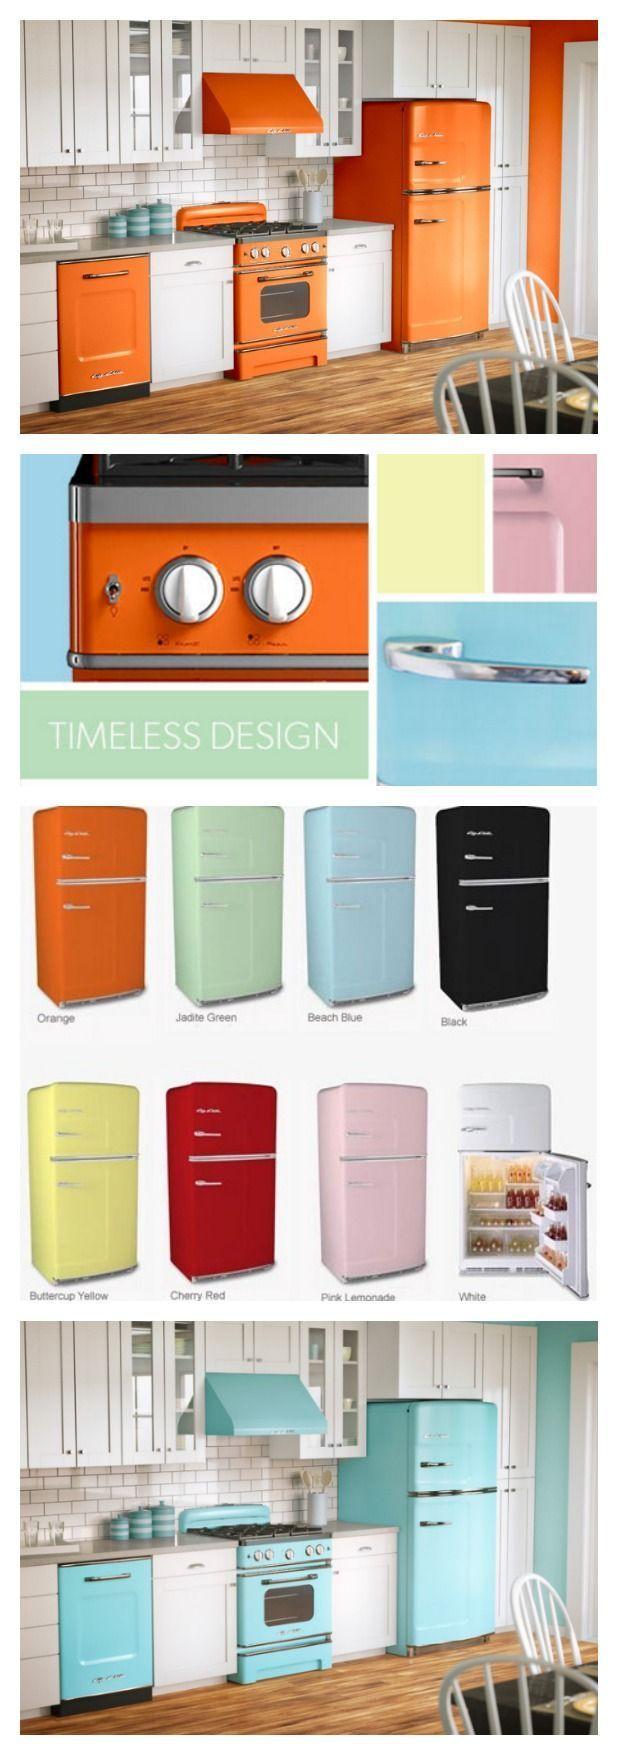 The Great America Fridge is Back! Stunning retro refrigerators in 200+ colors. Discover your dream retro fridge today!